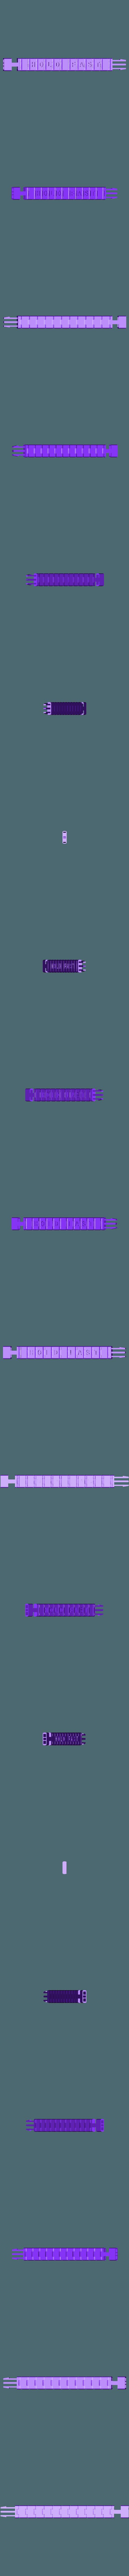 PiPCollar_TextInlay.stl Download free SCAD file Customizable Bracelet • 3D print model, Zippityboomba